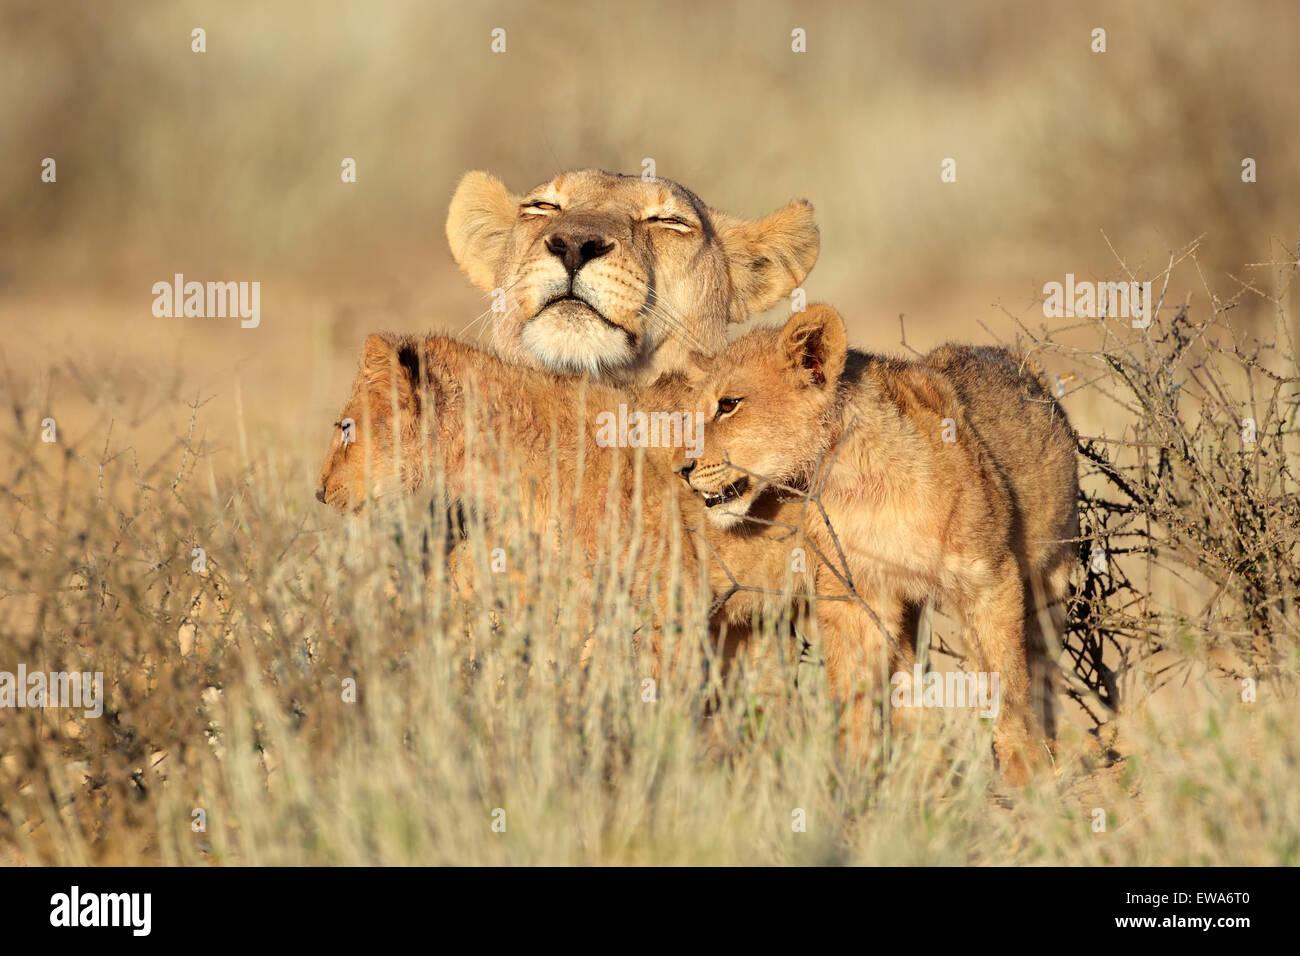 Löwin mit jungen junger Löwe (Panthera Leo), Kalahari-Wüste, Südafrika Stockbild